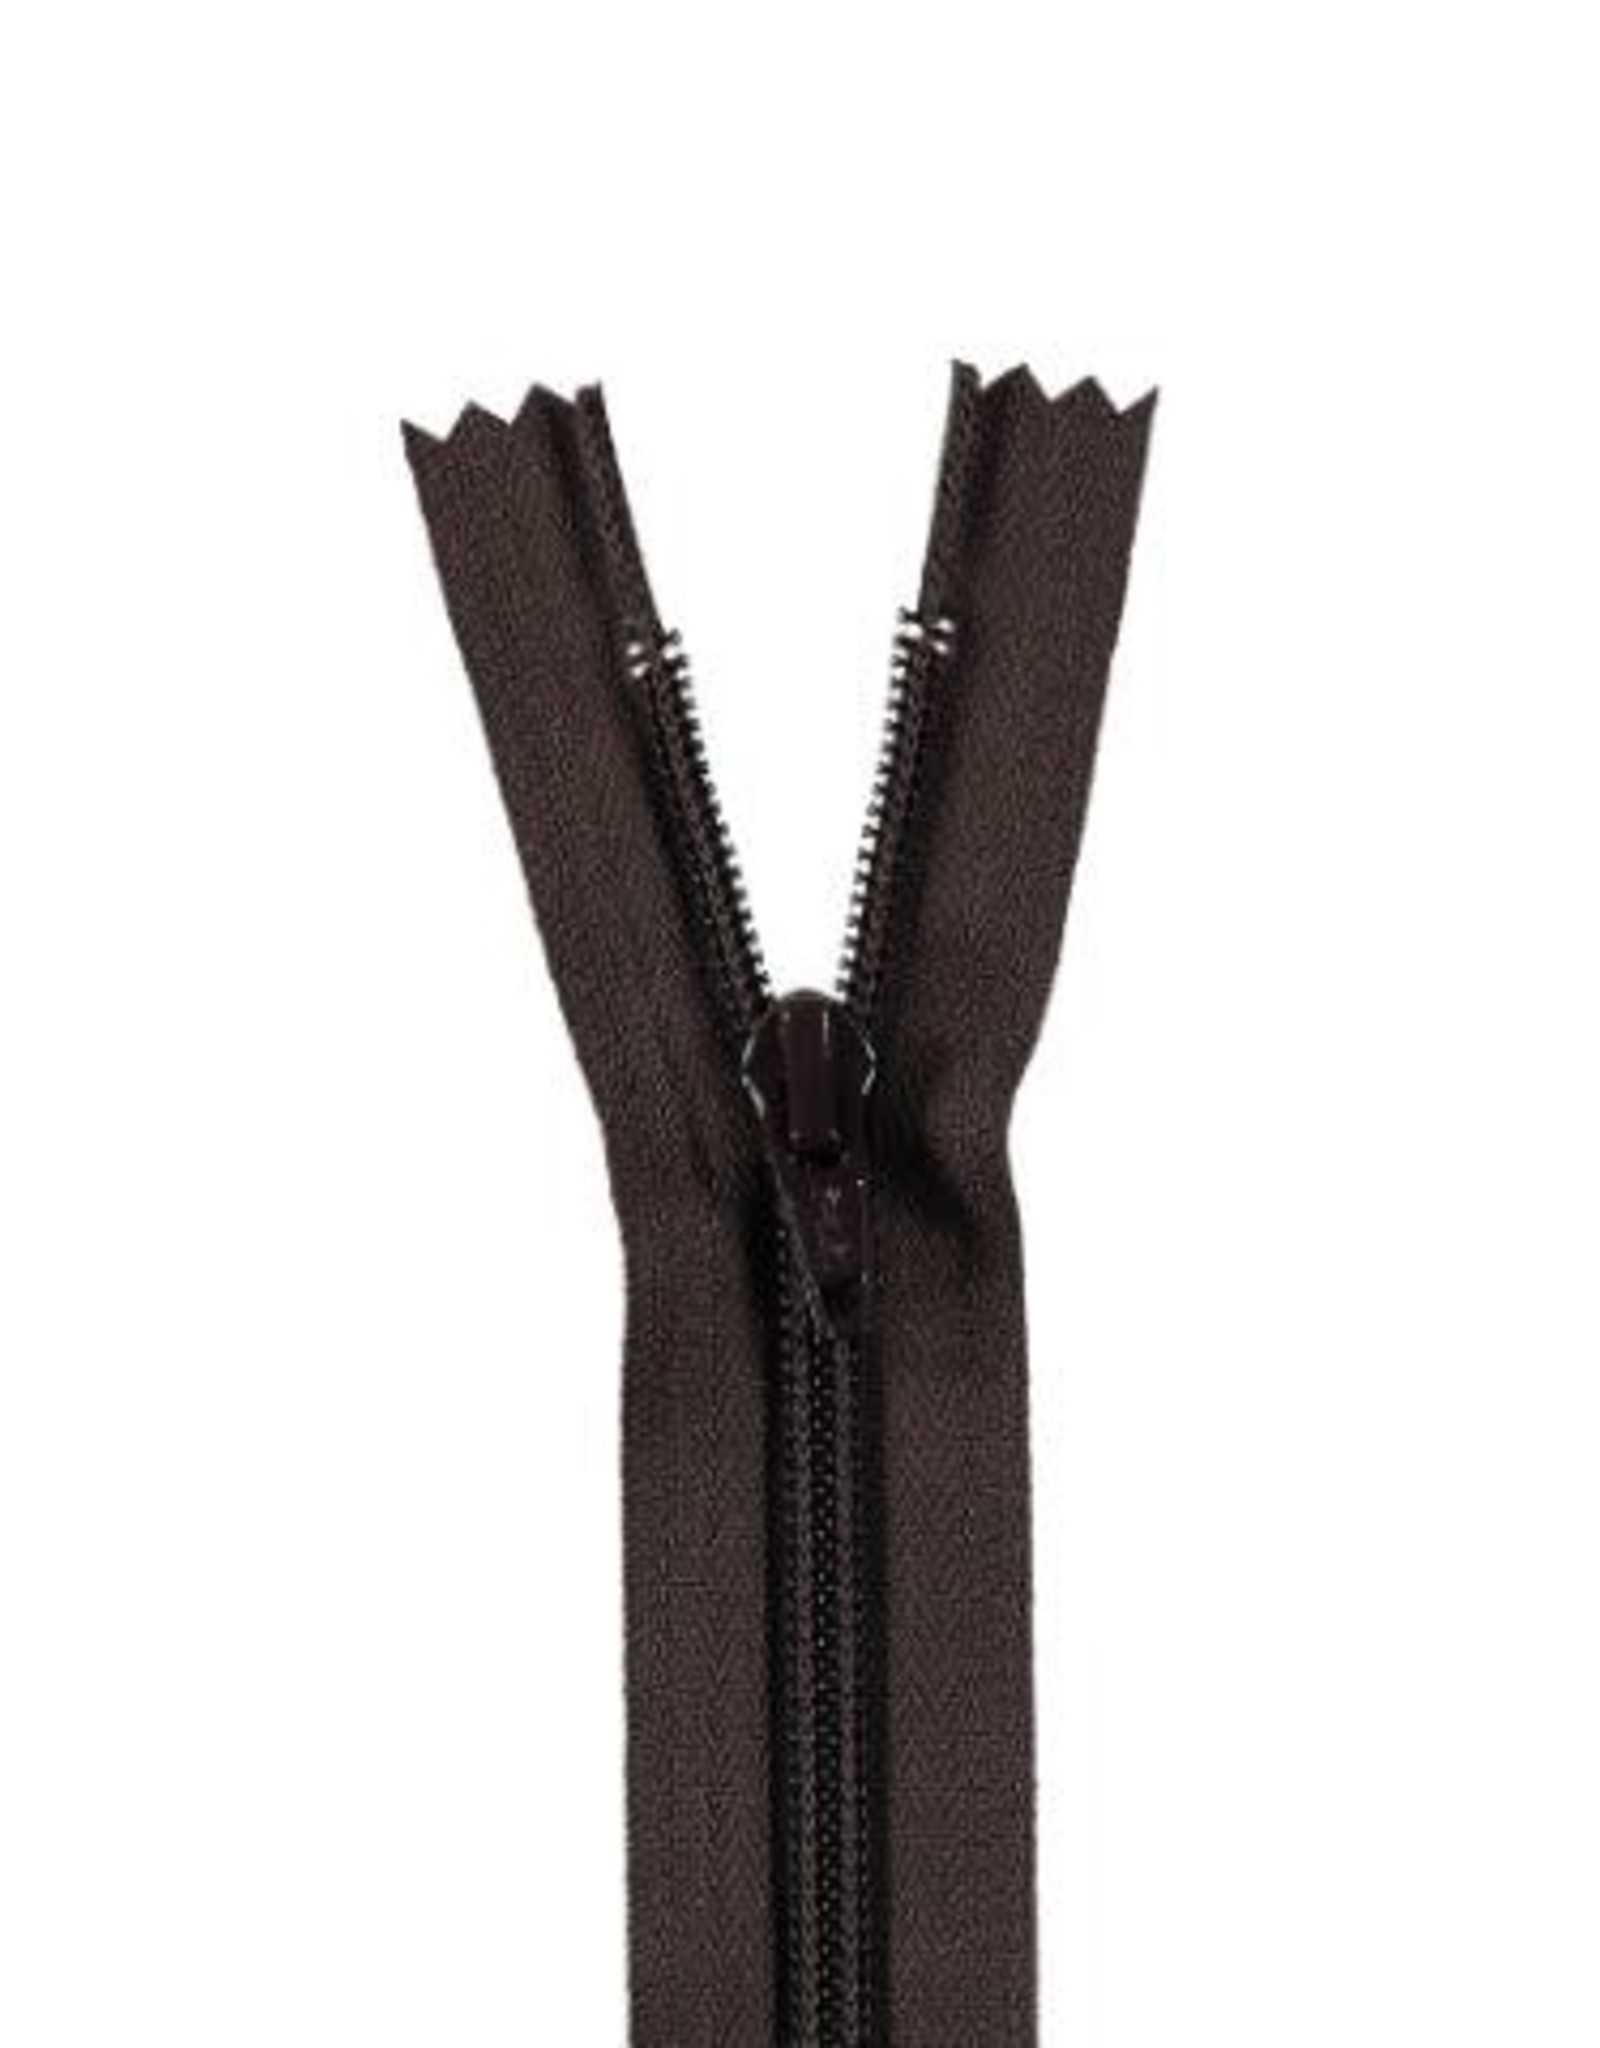 YKK Spiraalrits niet-DB 3mm donker bruin 570-55cm